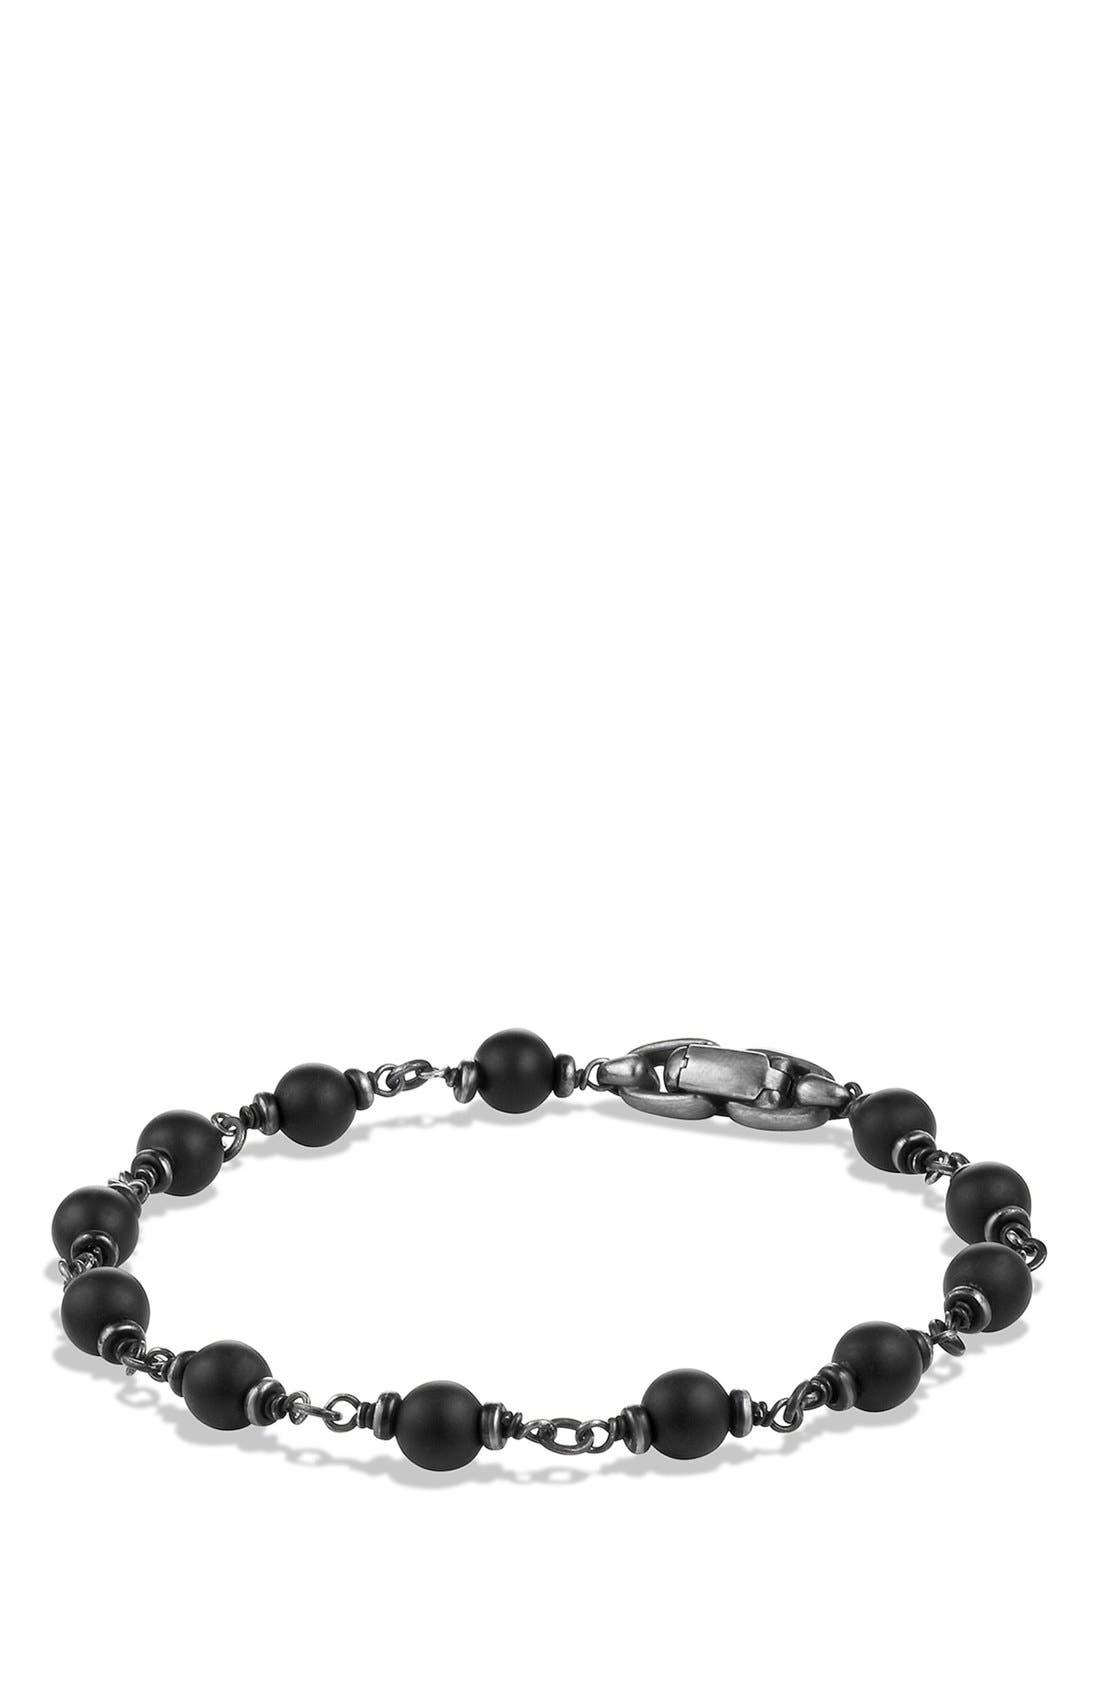 David Yurman 'Spiritual Beads' Rosary Bead Bracelet